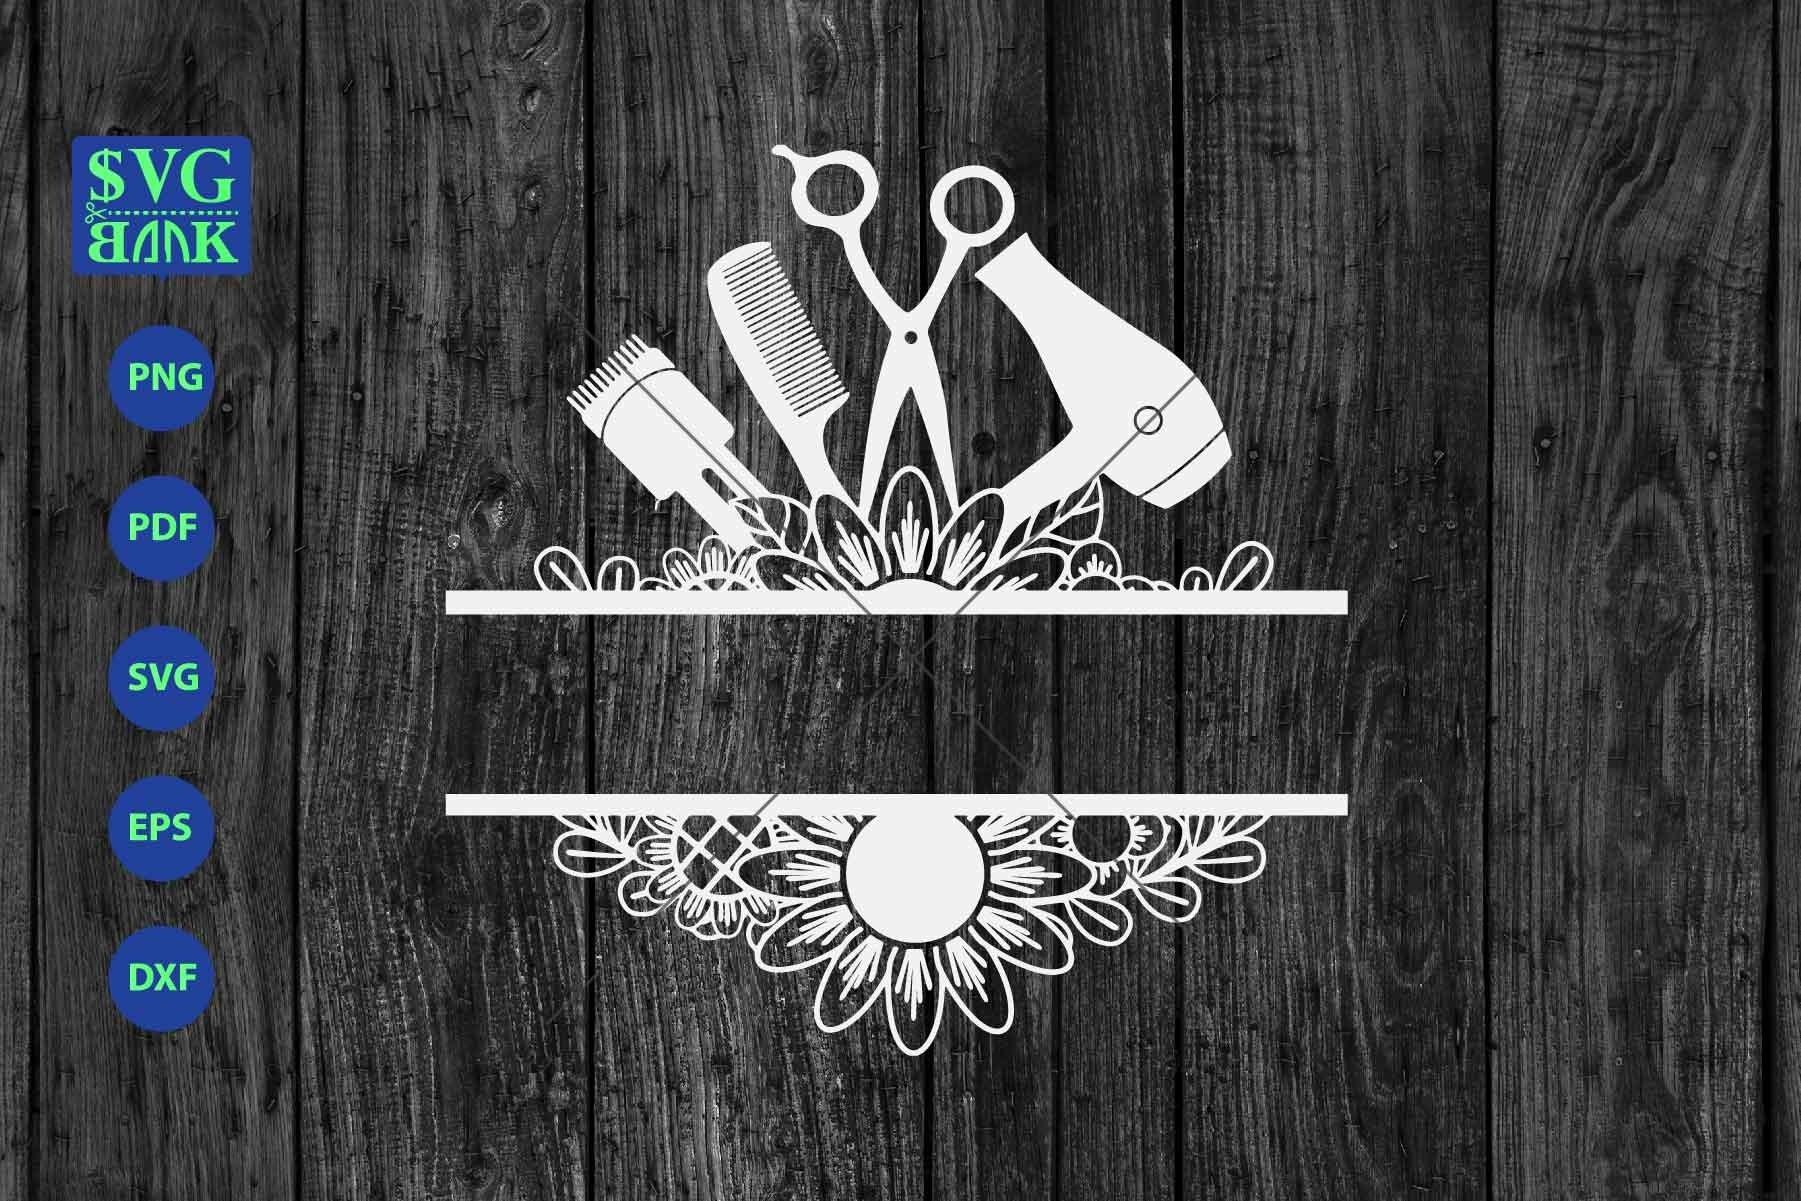 Download Hair Salon Split Monogram Svg Hair Salon Tools Svg Dxf 309412 Cut Files Design Bundles